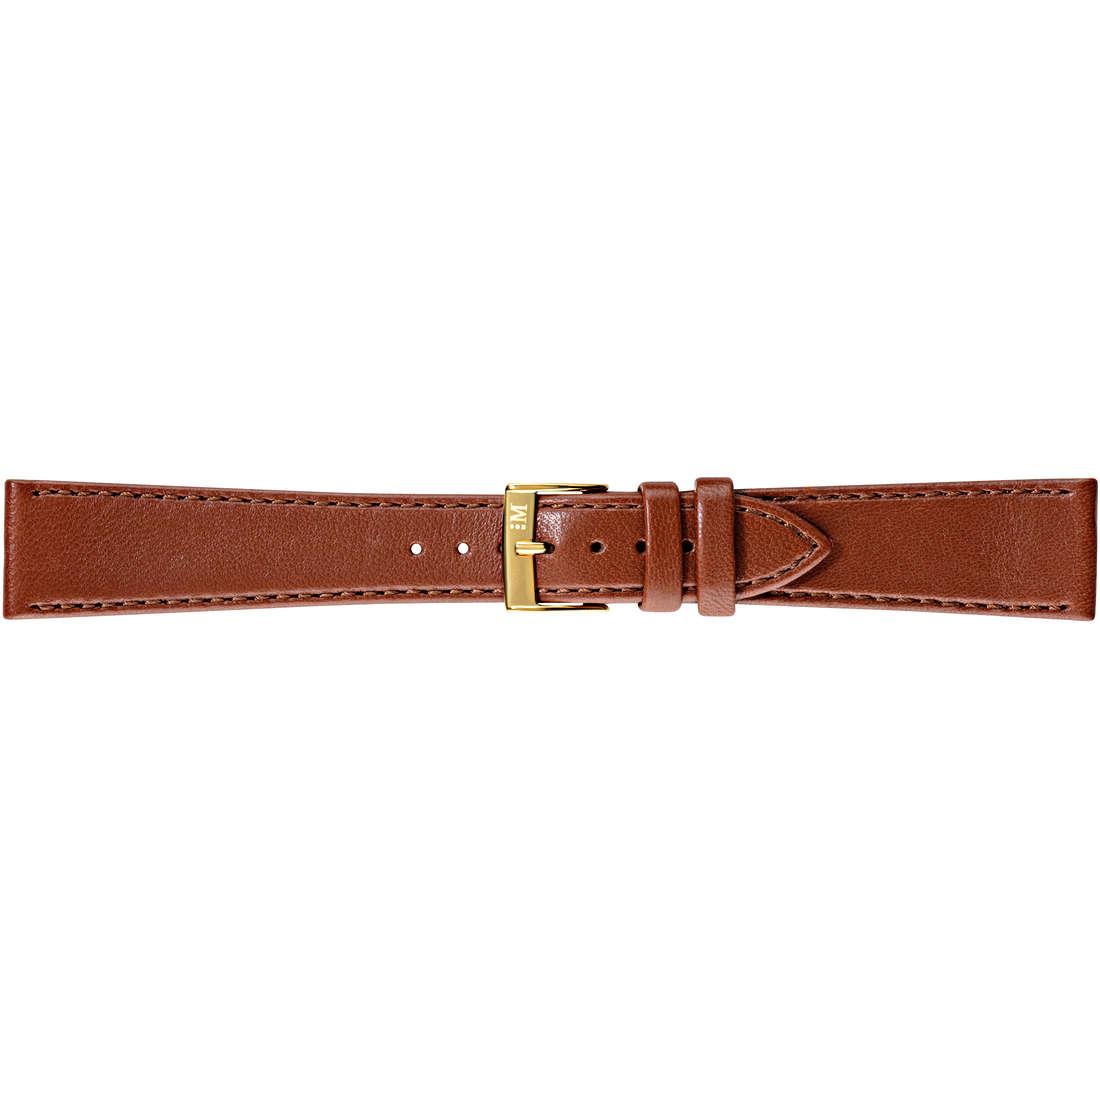 watch watch bands watch straps man Morellato Morellato 1930 A01U0770006041DO16